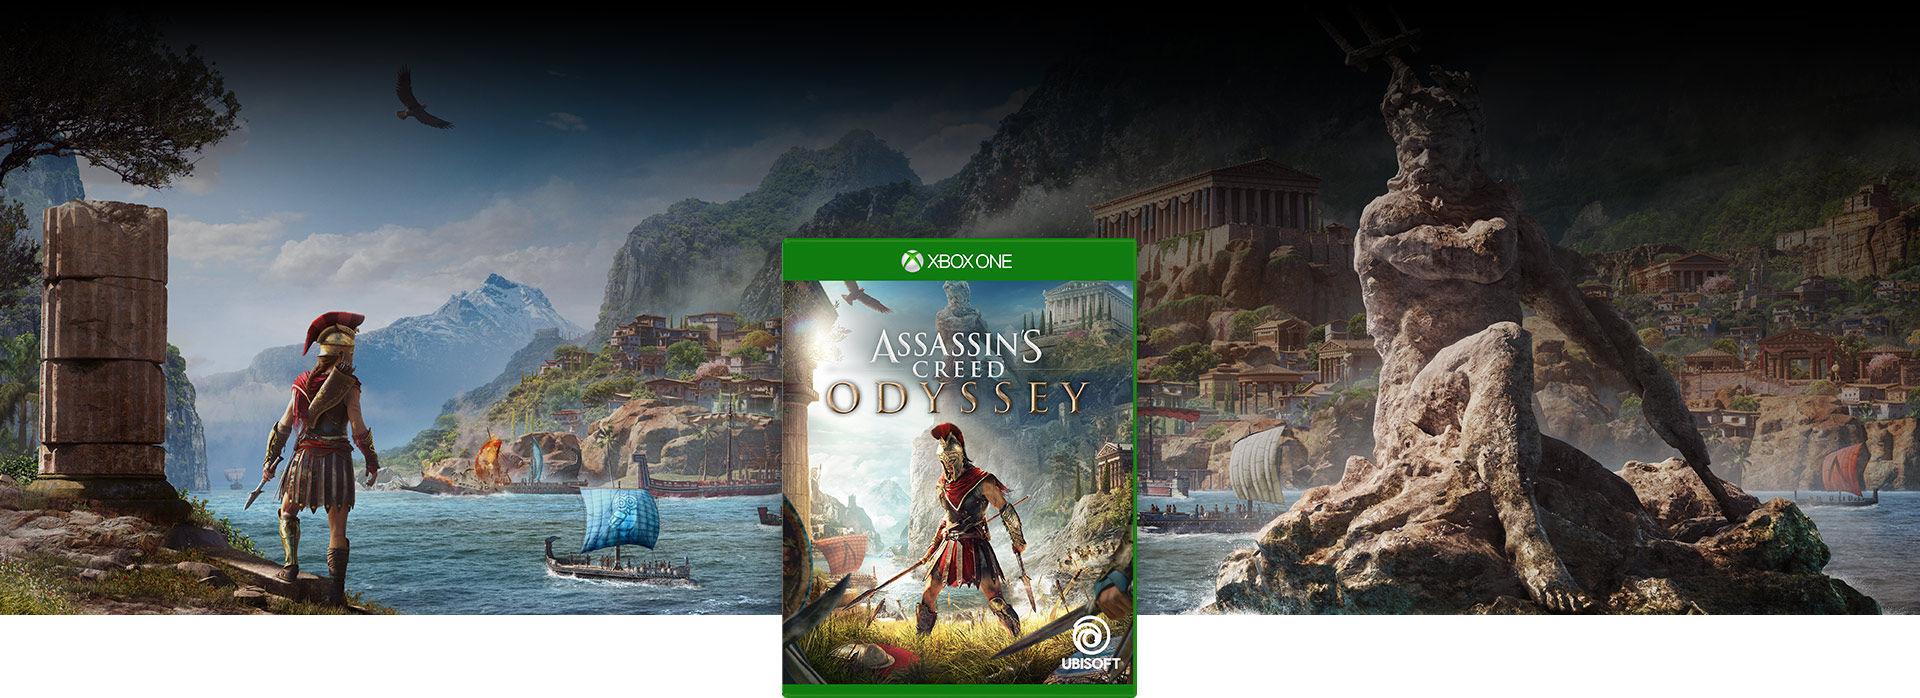 Assassins Creed Odyssey trovaprezzi